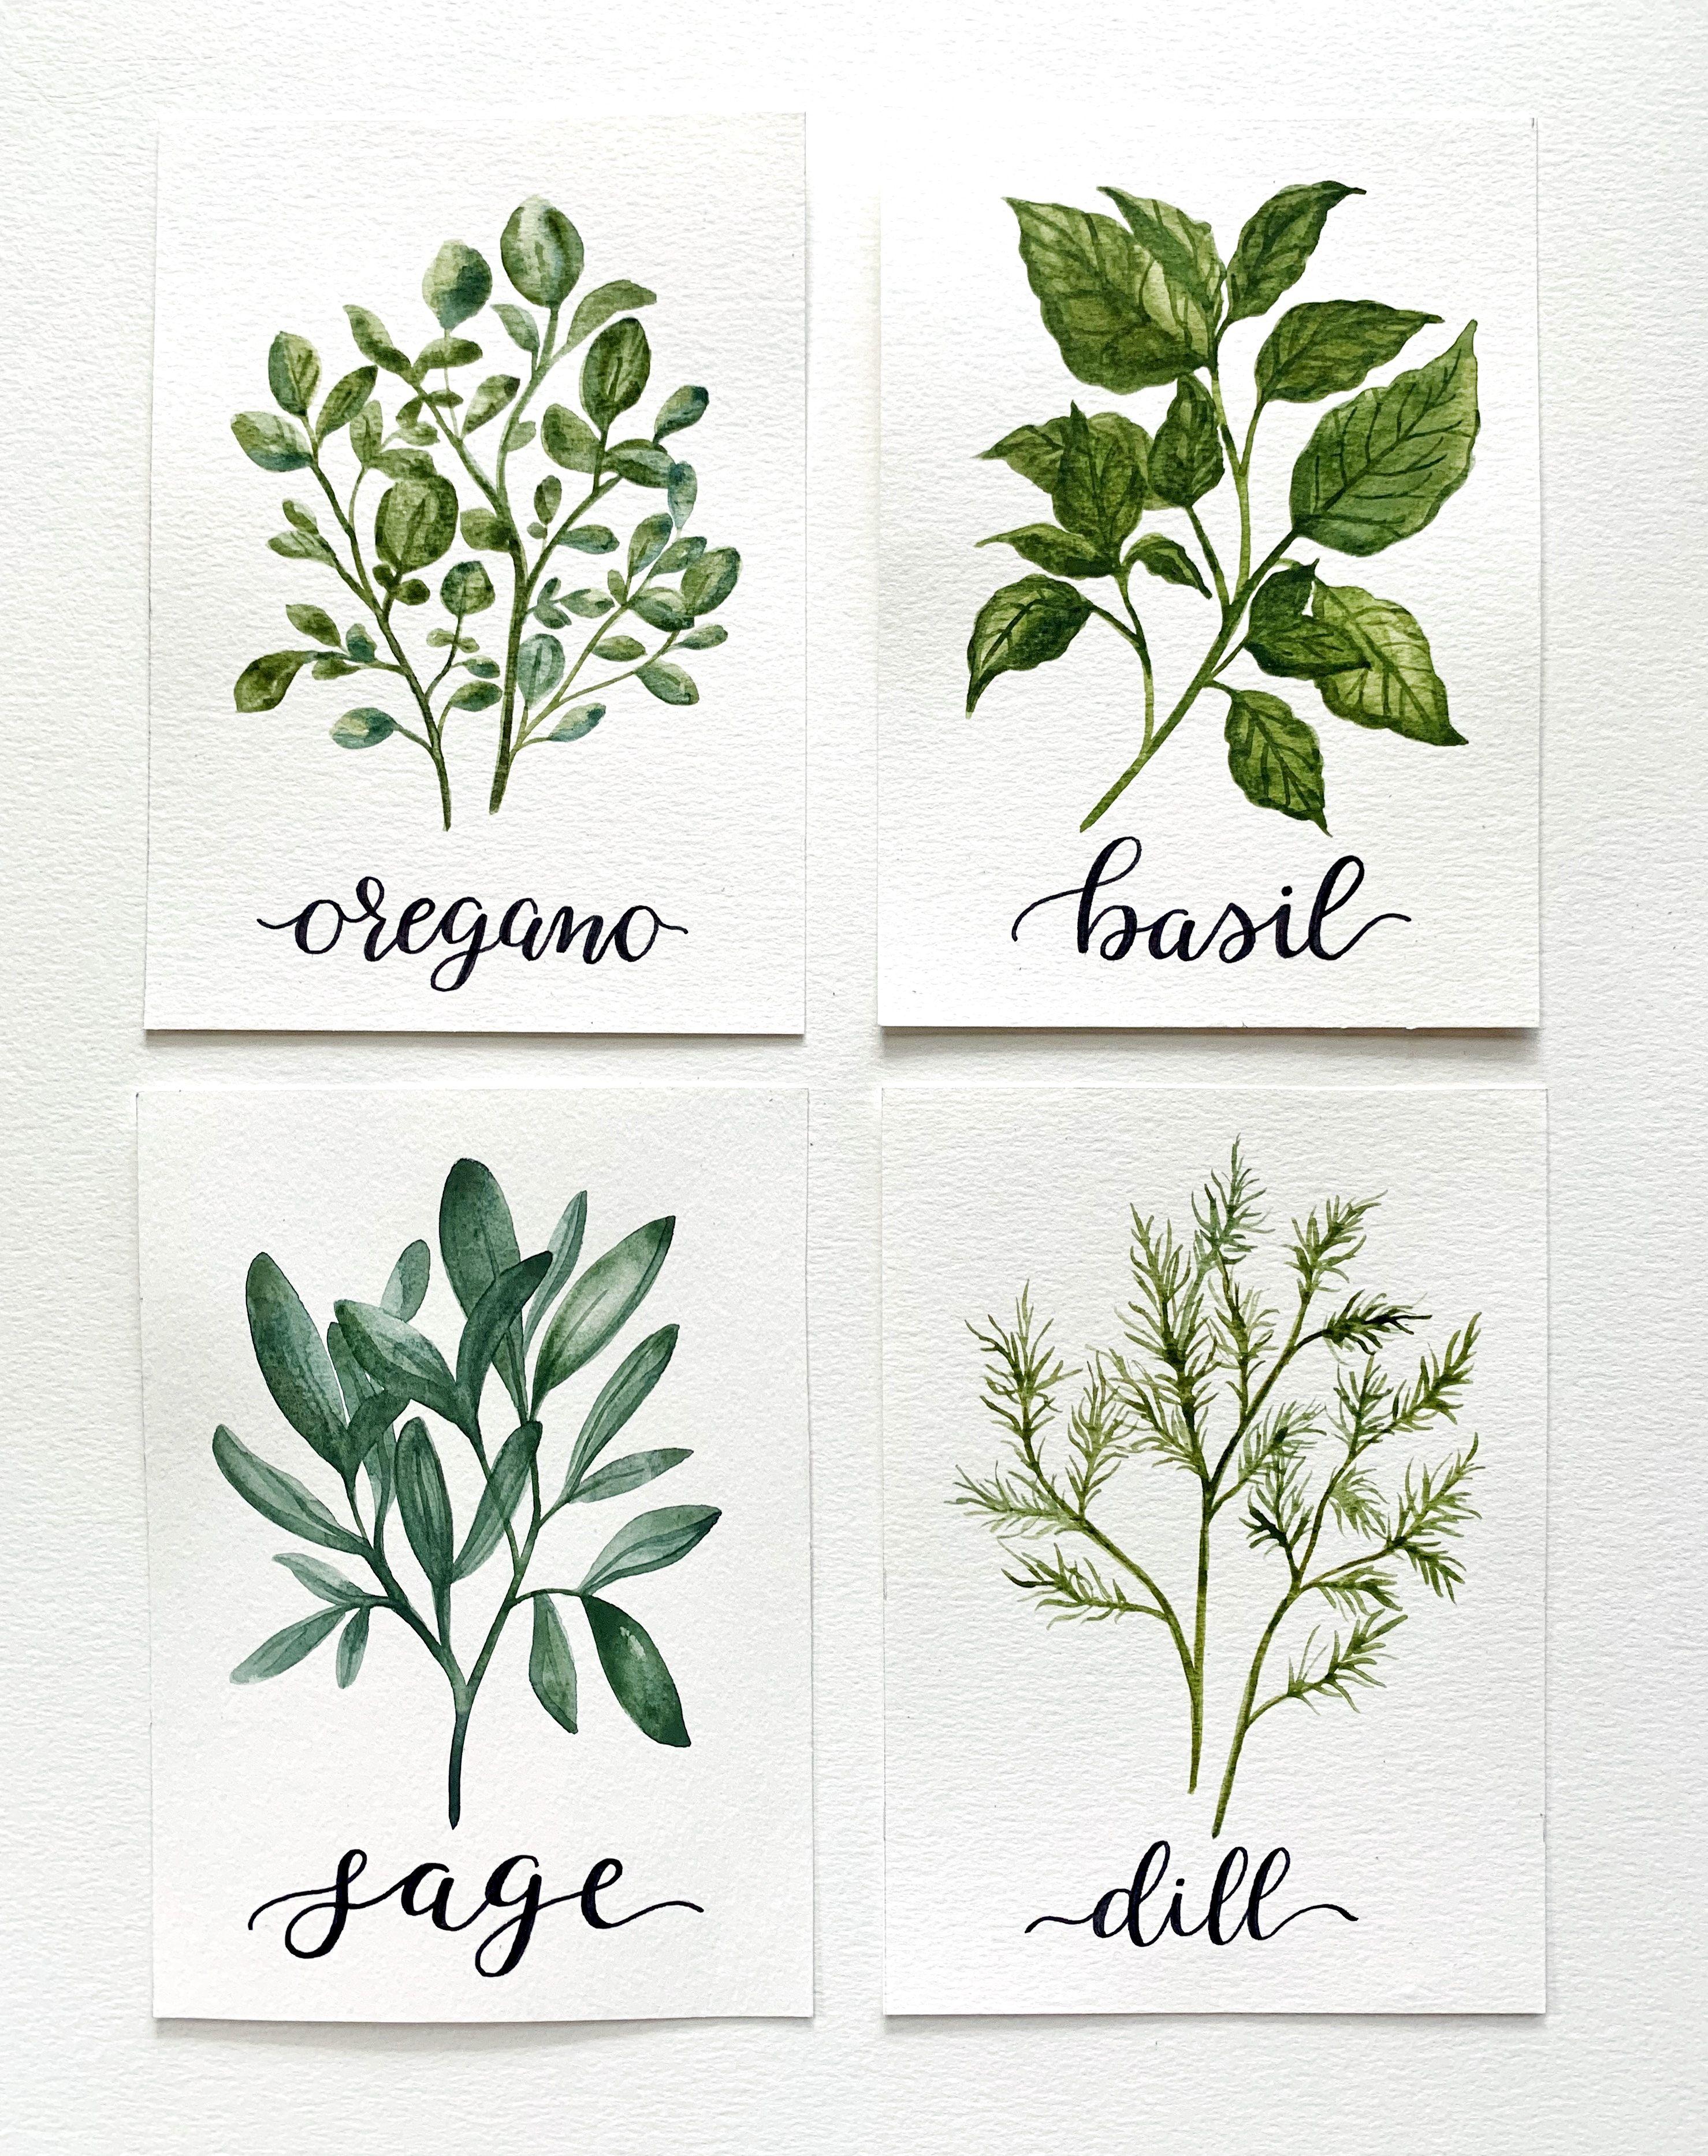 Watercolor herbs painted by The Fleur Wreath #herbs #gardening #herbgarden #botanicalwatercolor #watercolorart #painting